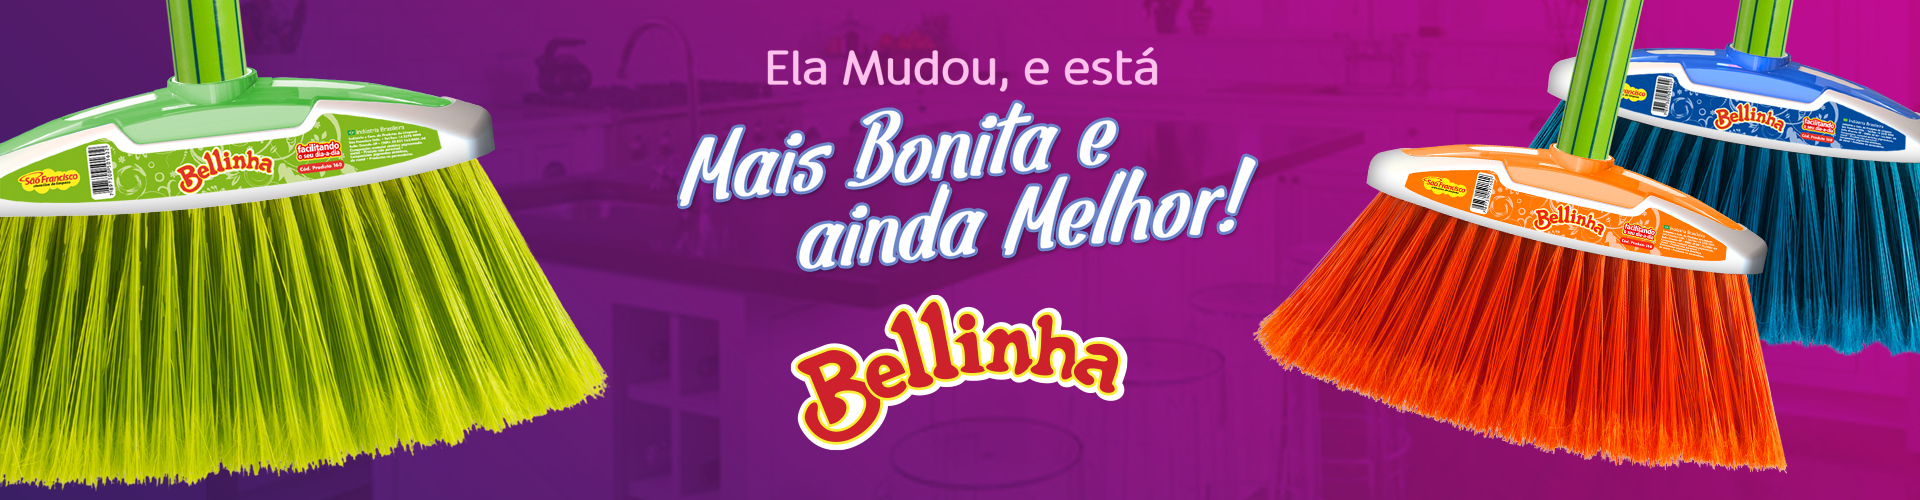 Nova Vassoura Bellinha